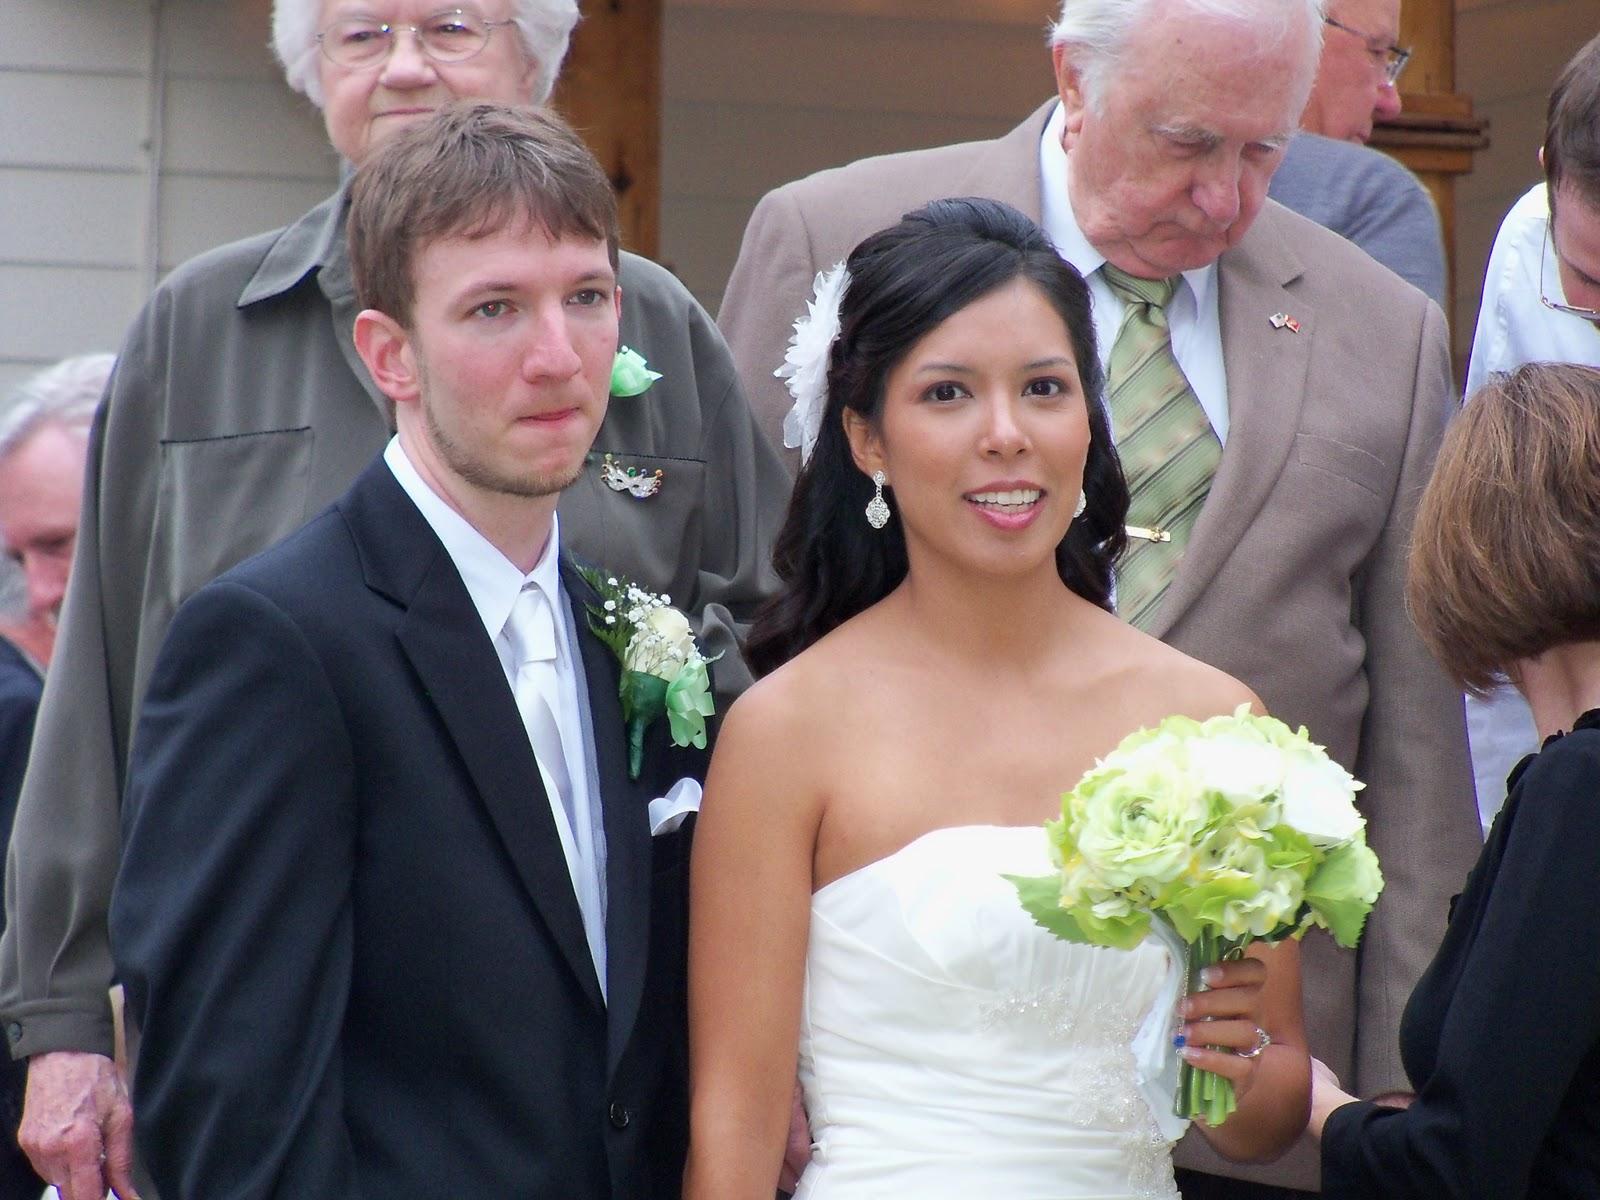 Ben and Jessica Coons wedding - 115_0812.JPG